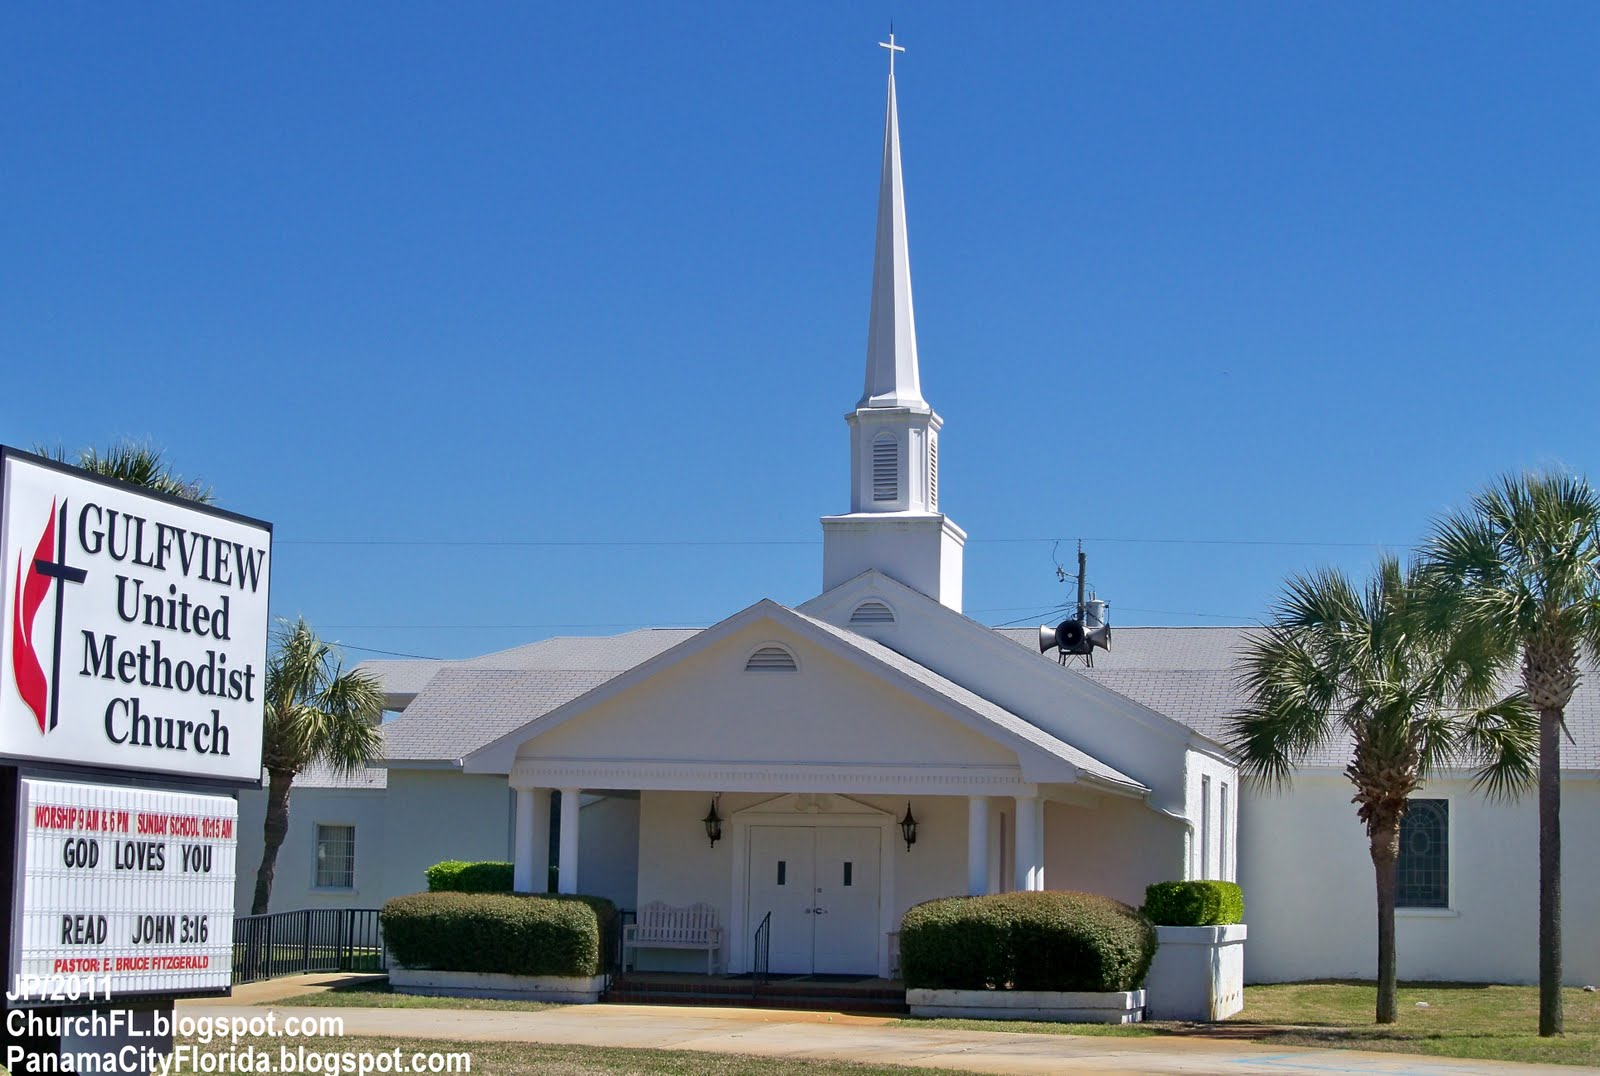 Panama City Beach Baptist Churches